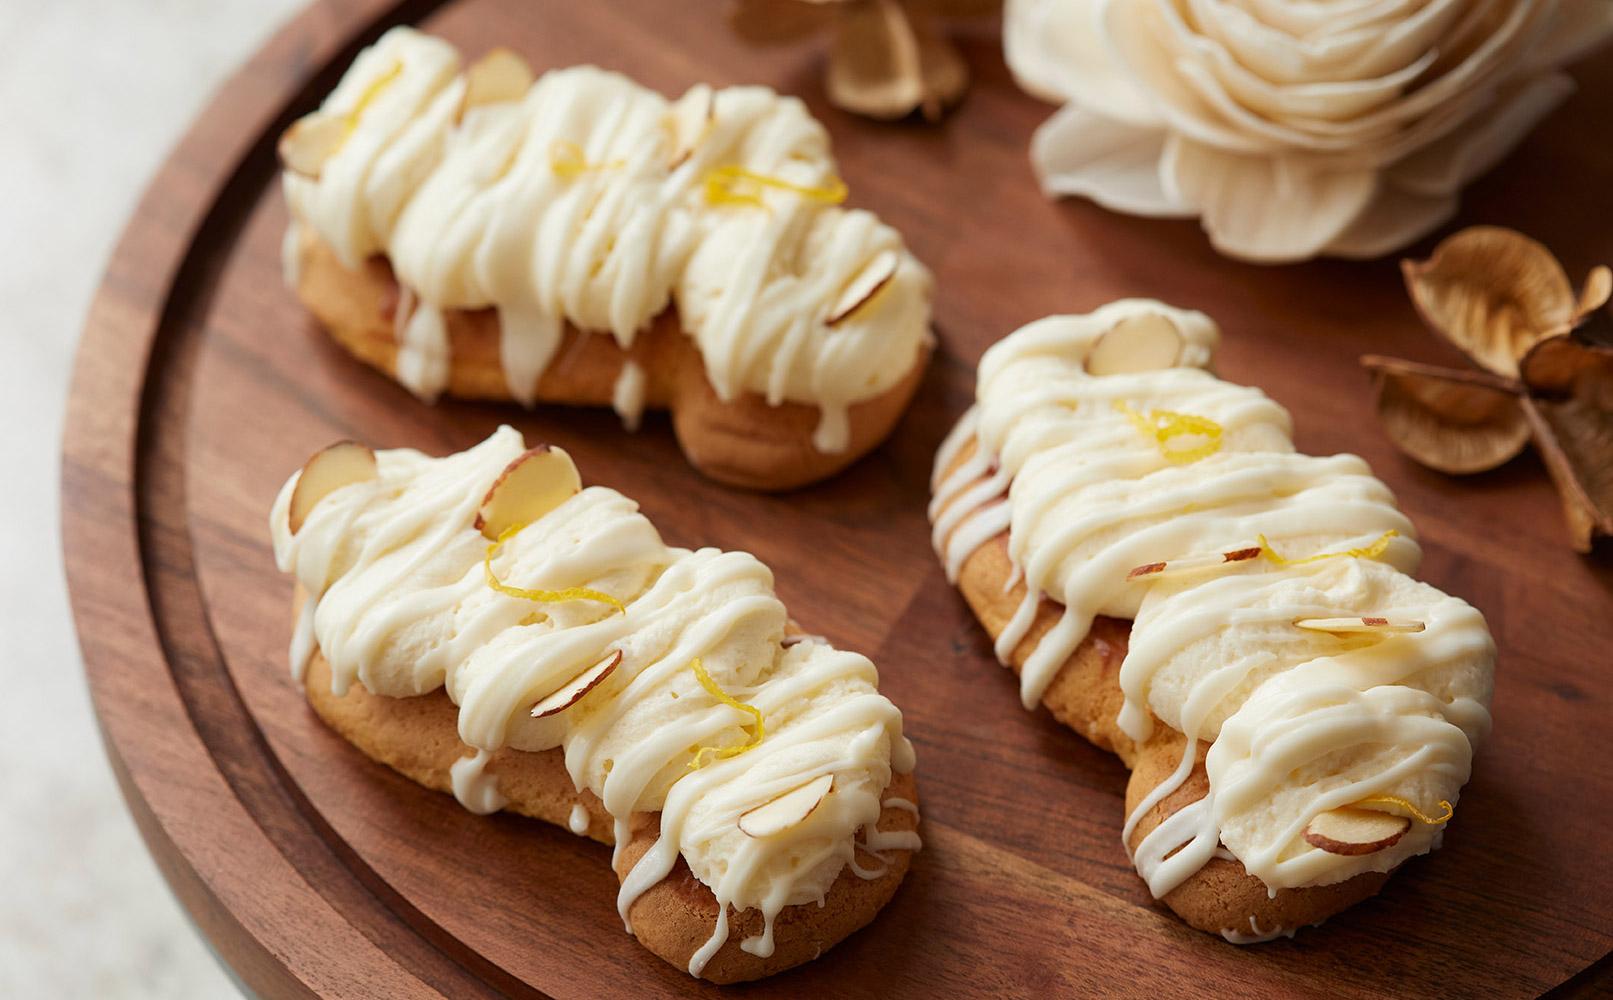 Lemon Crème French Pastry